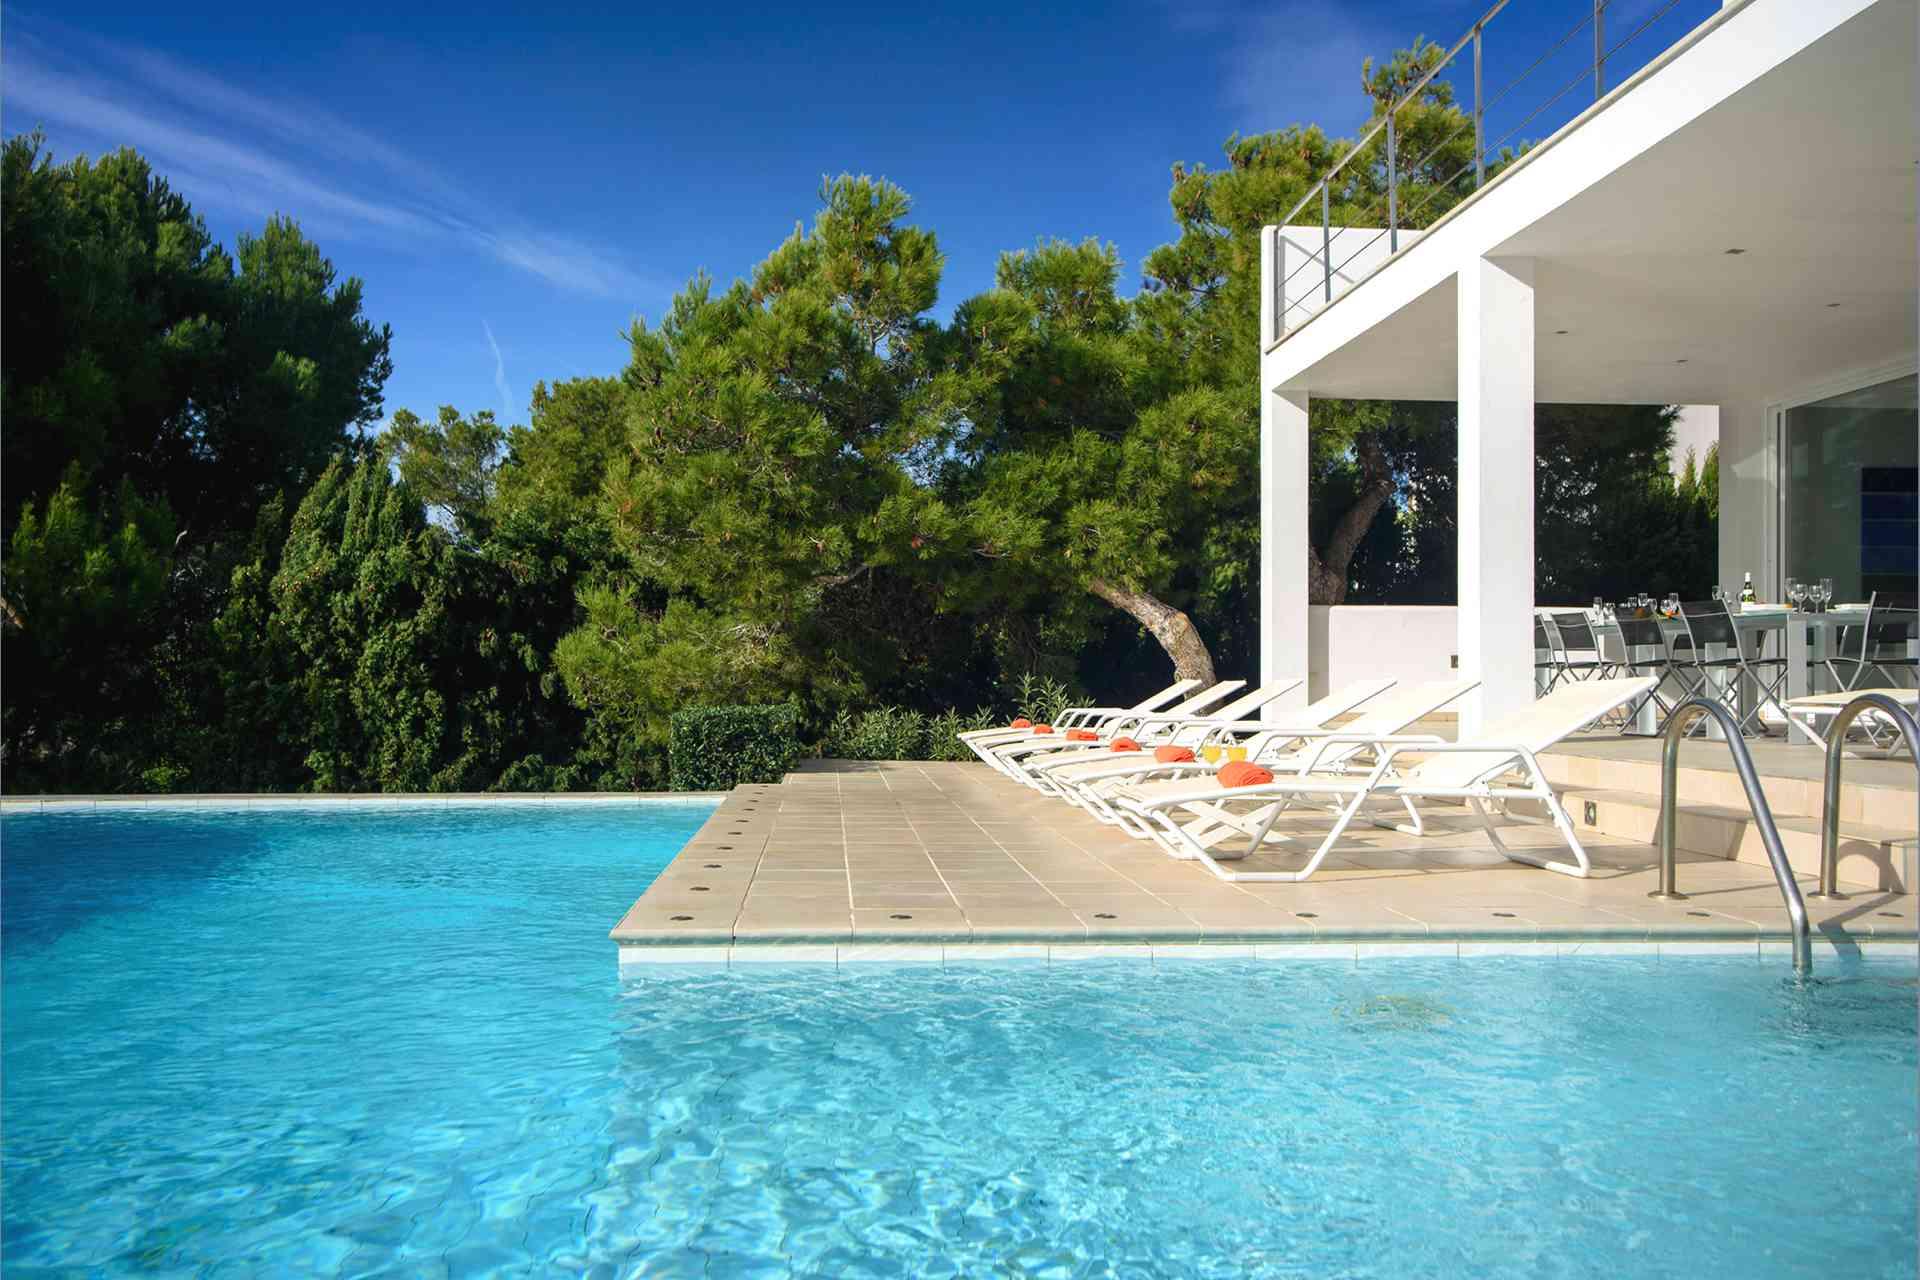 01-156 moderne Meerblick Villa Mallorca Osten Bild 7